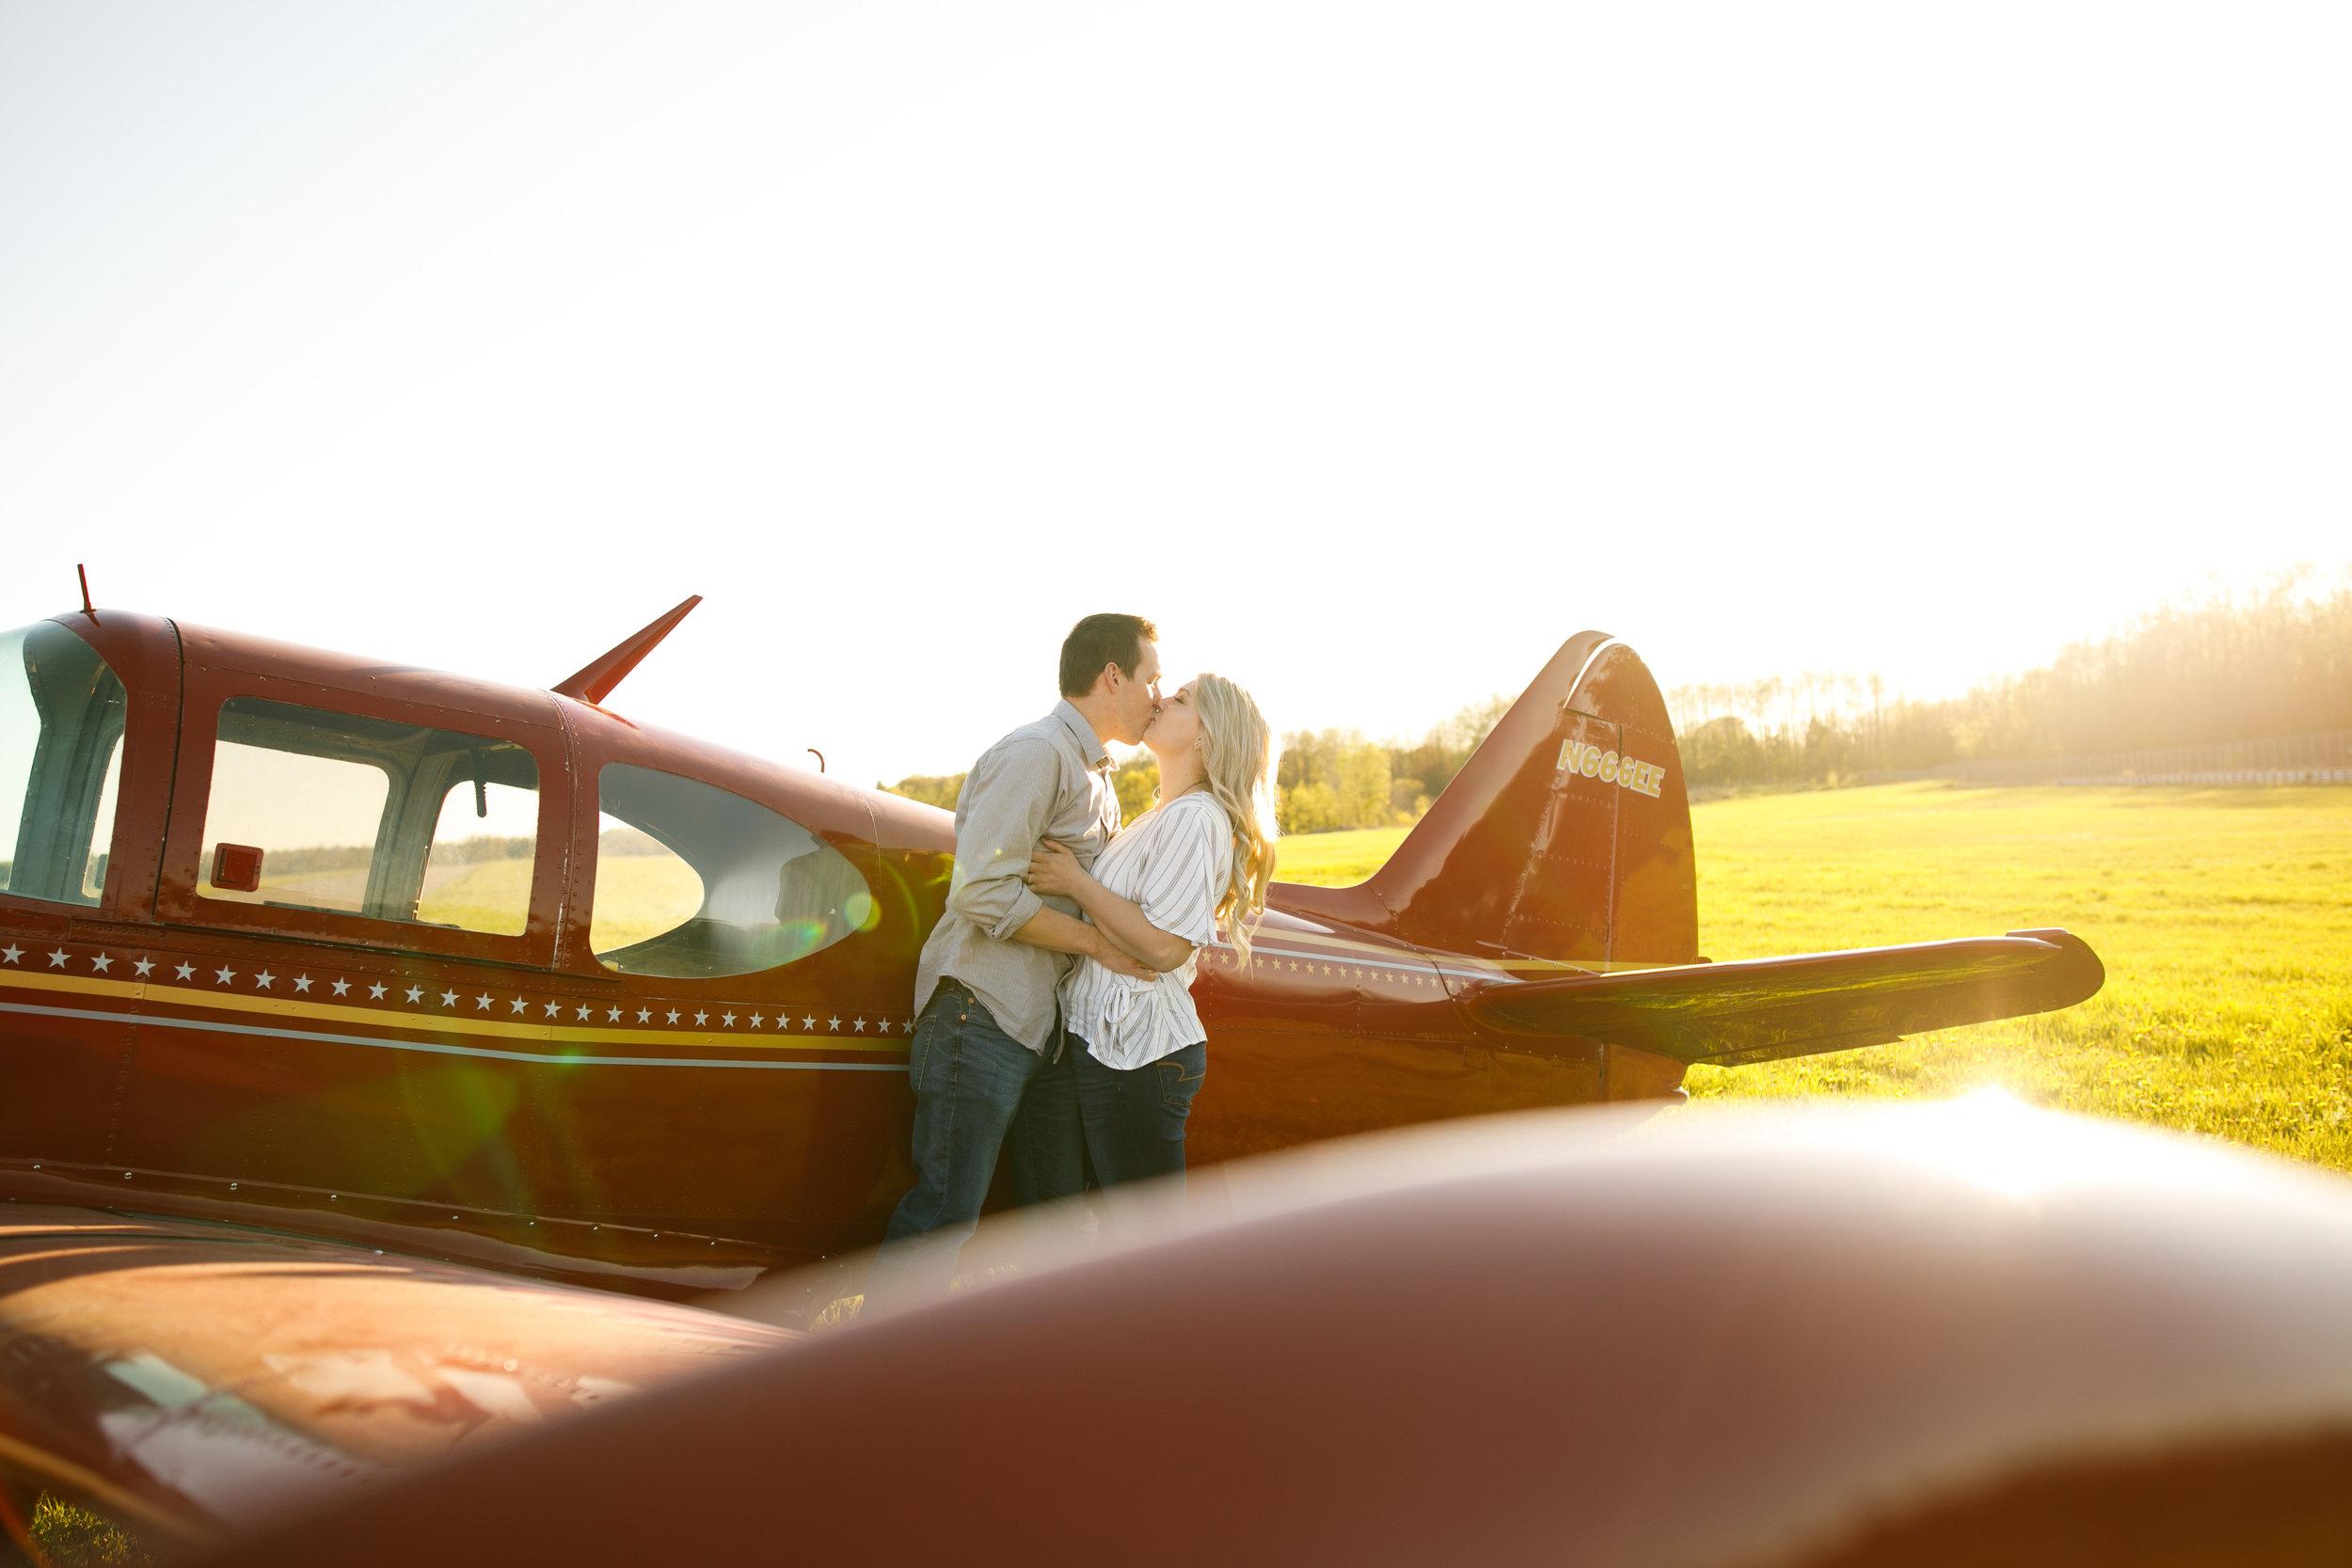 Grand Rapids Photographer - J Darling Photo - jessica darling - grand rapids wedding photographer - sparta airport - sparta michigan - jasmine and jeff engaged 035.jpg